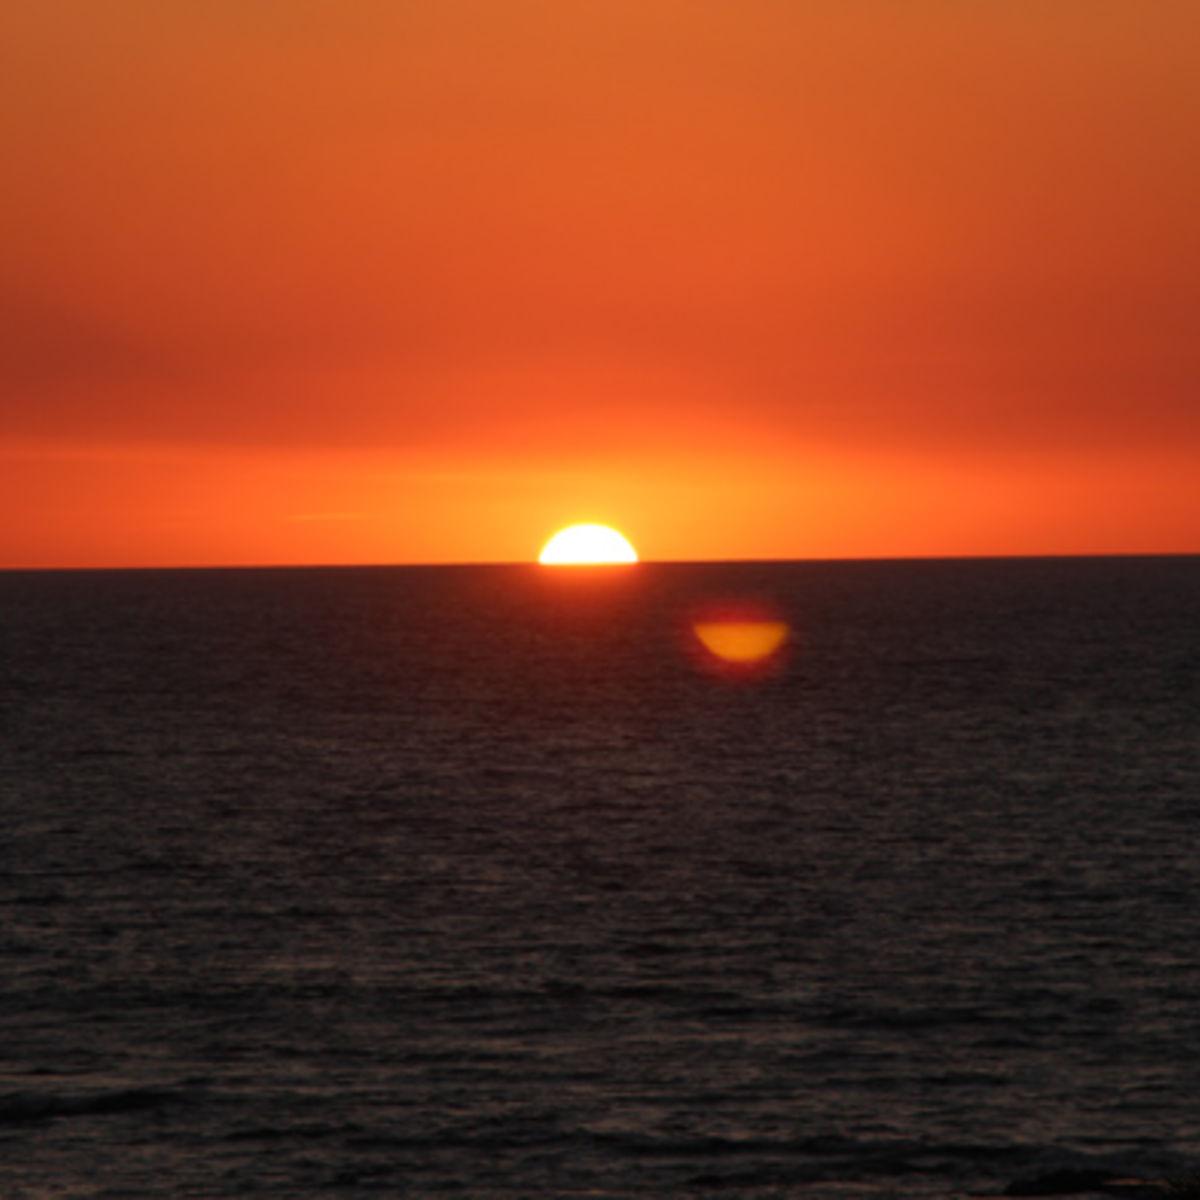 hawaii_sunset_2.jpg